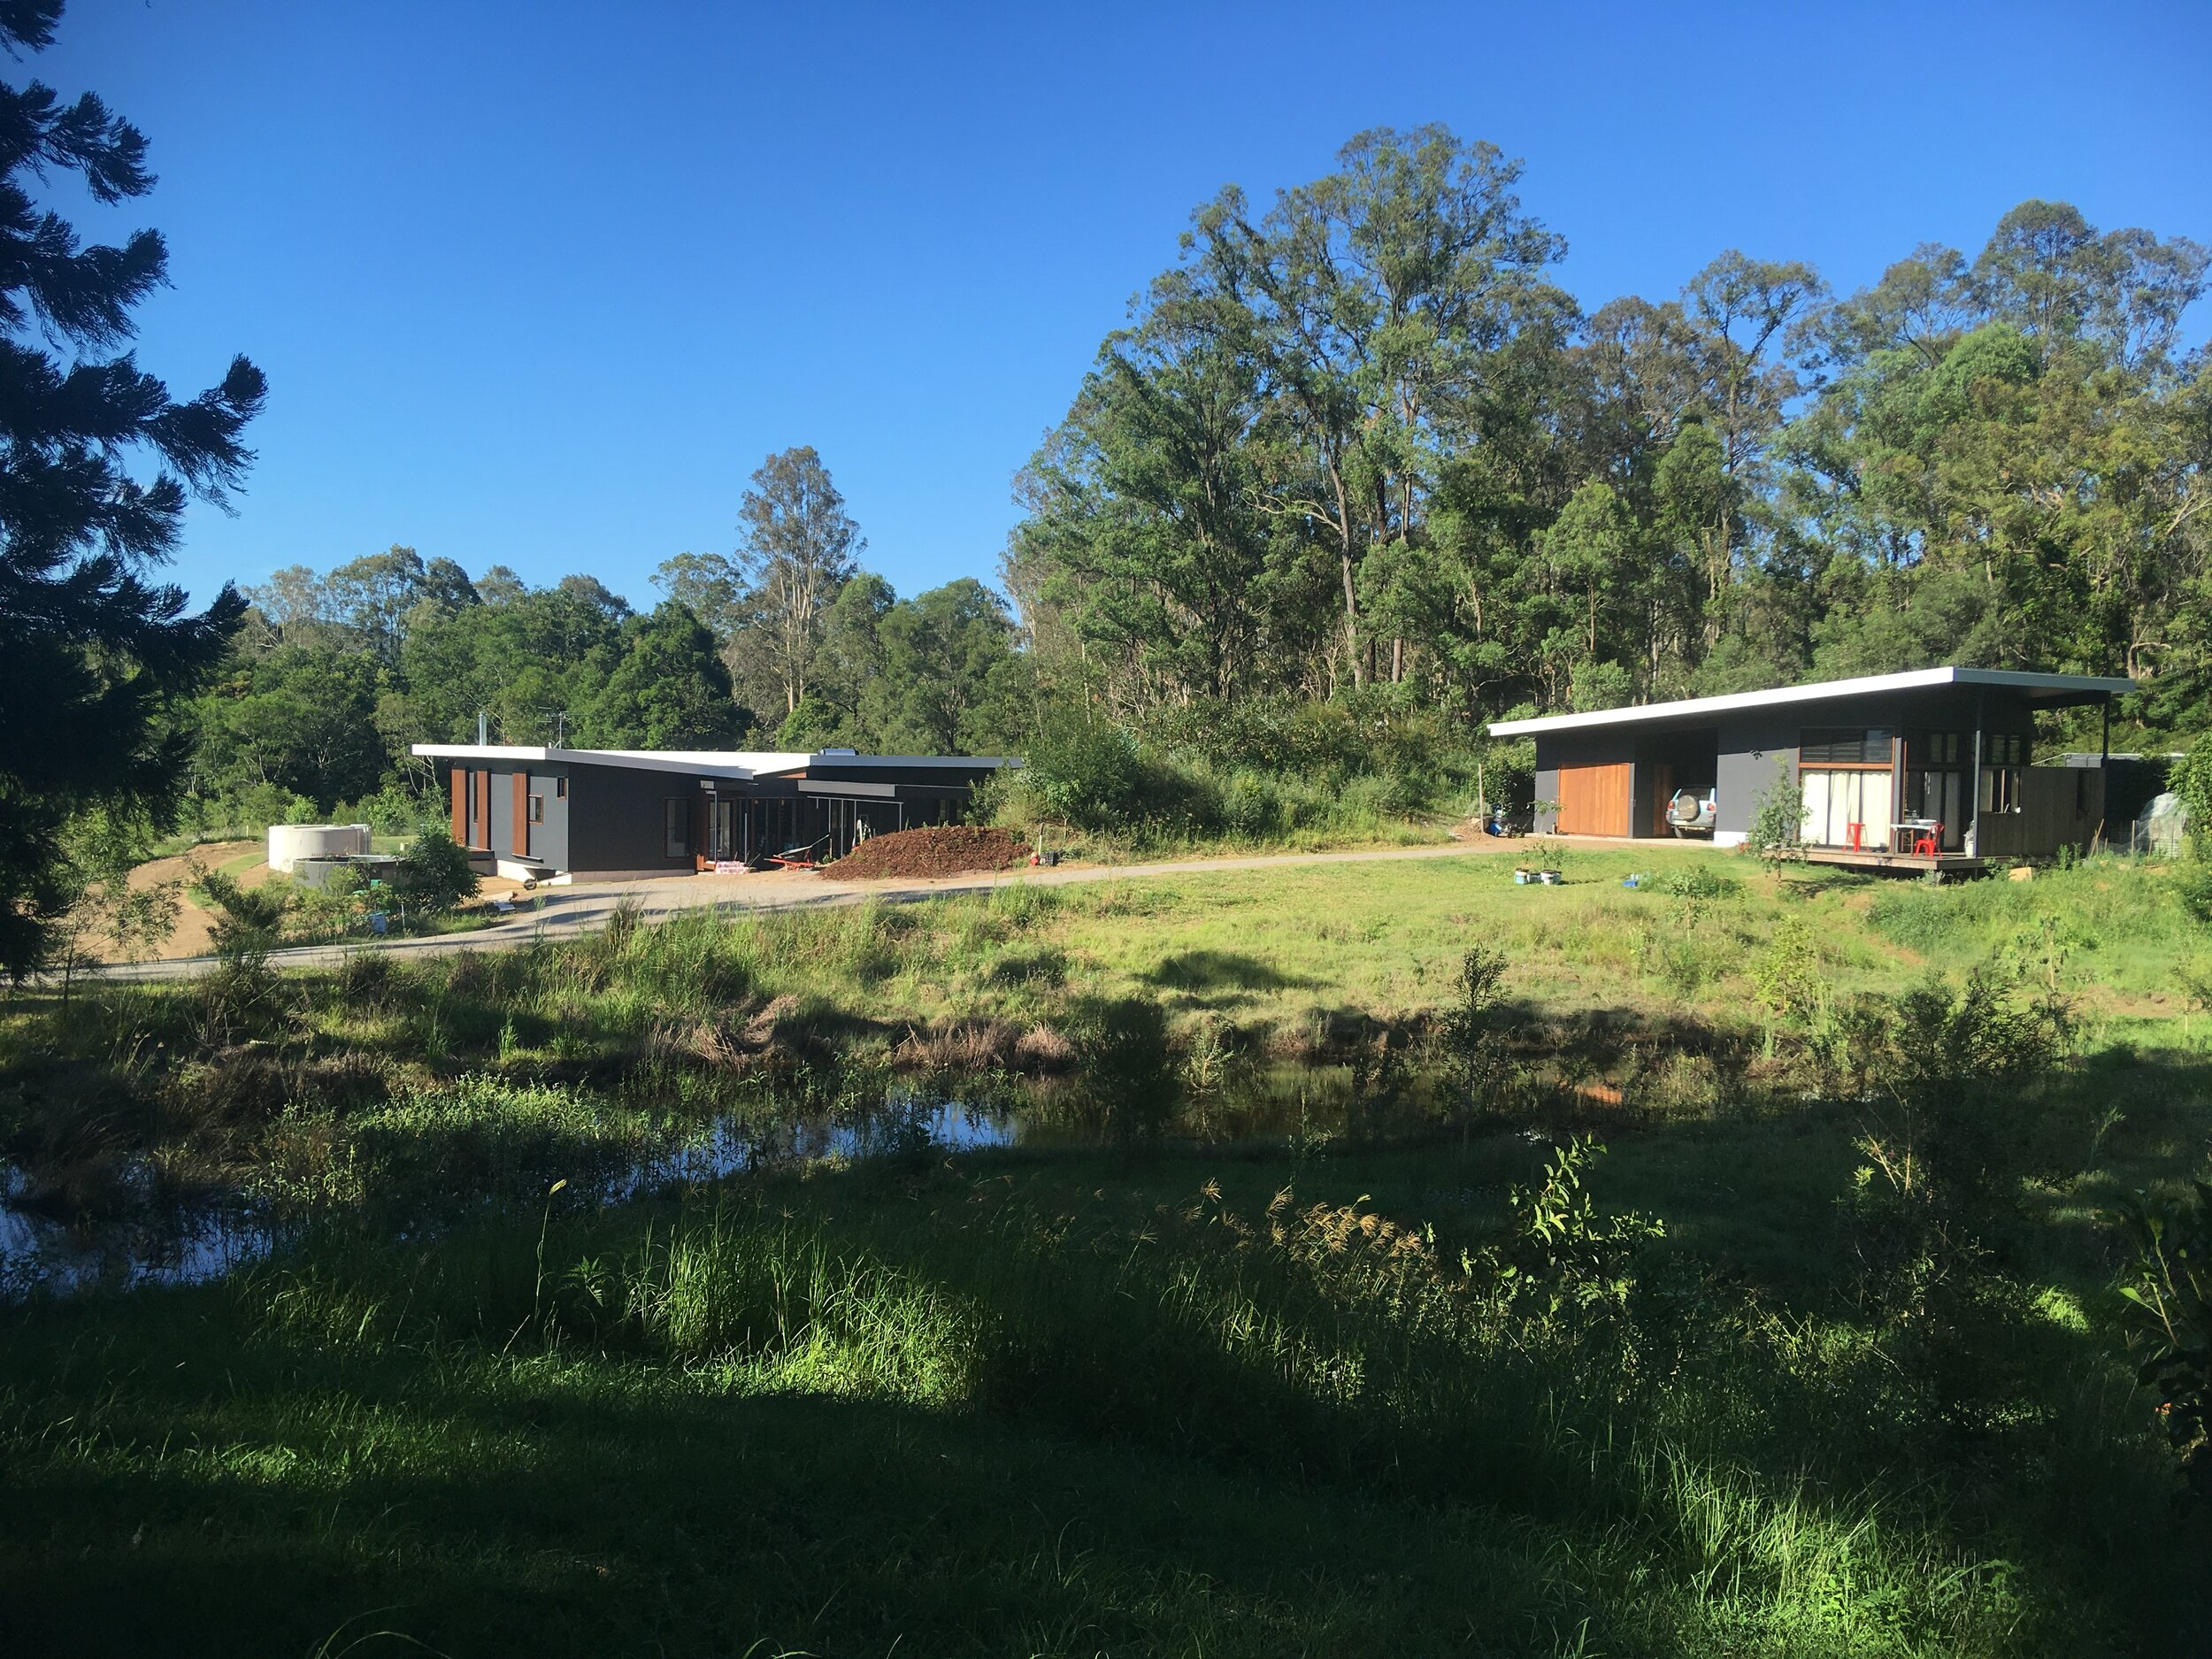 20171218 camp mountain house 3.JPG